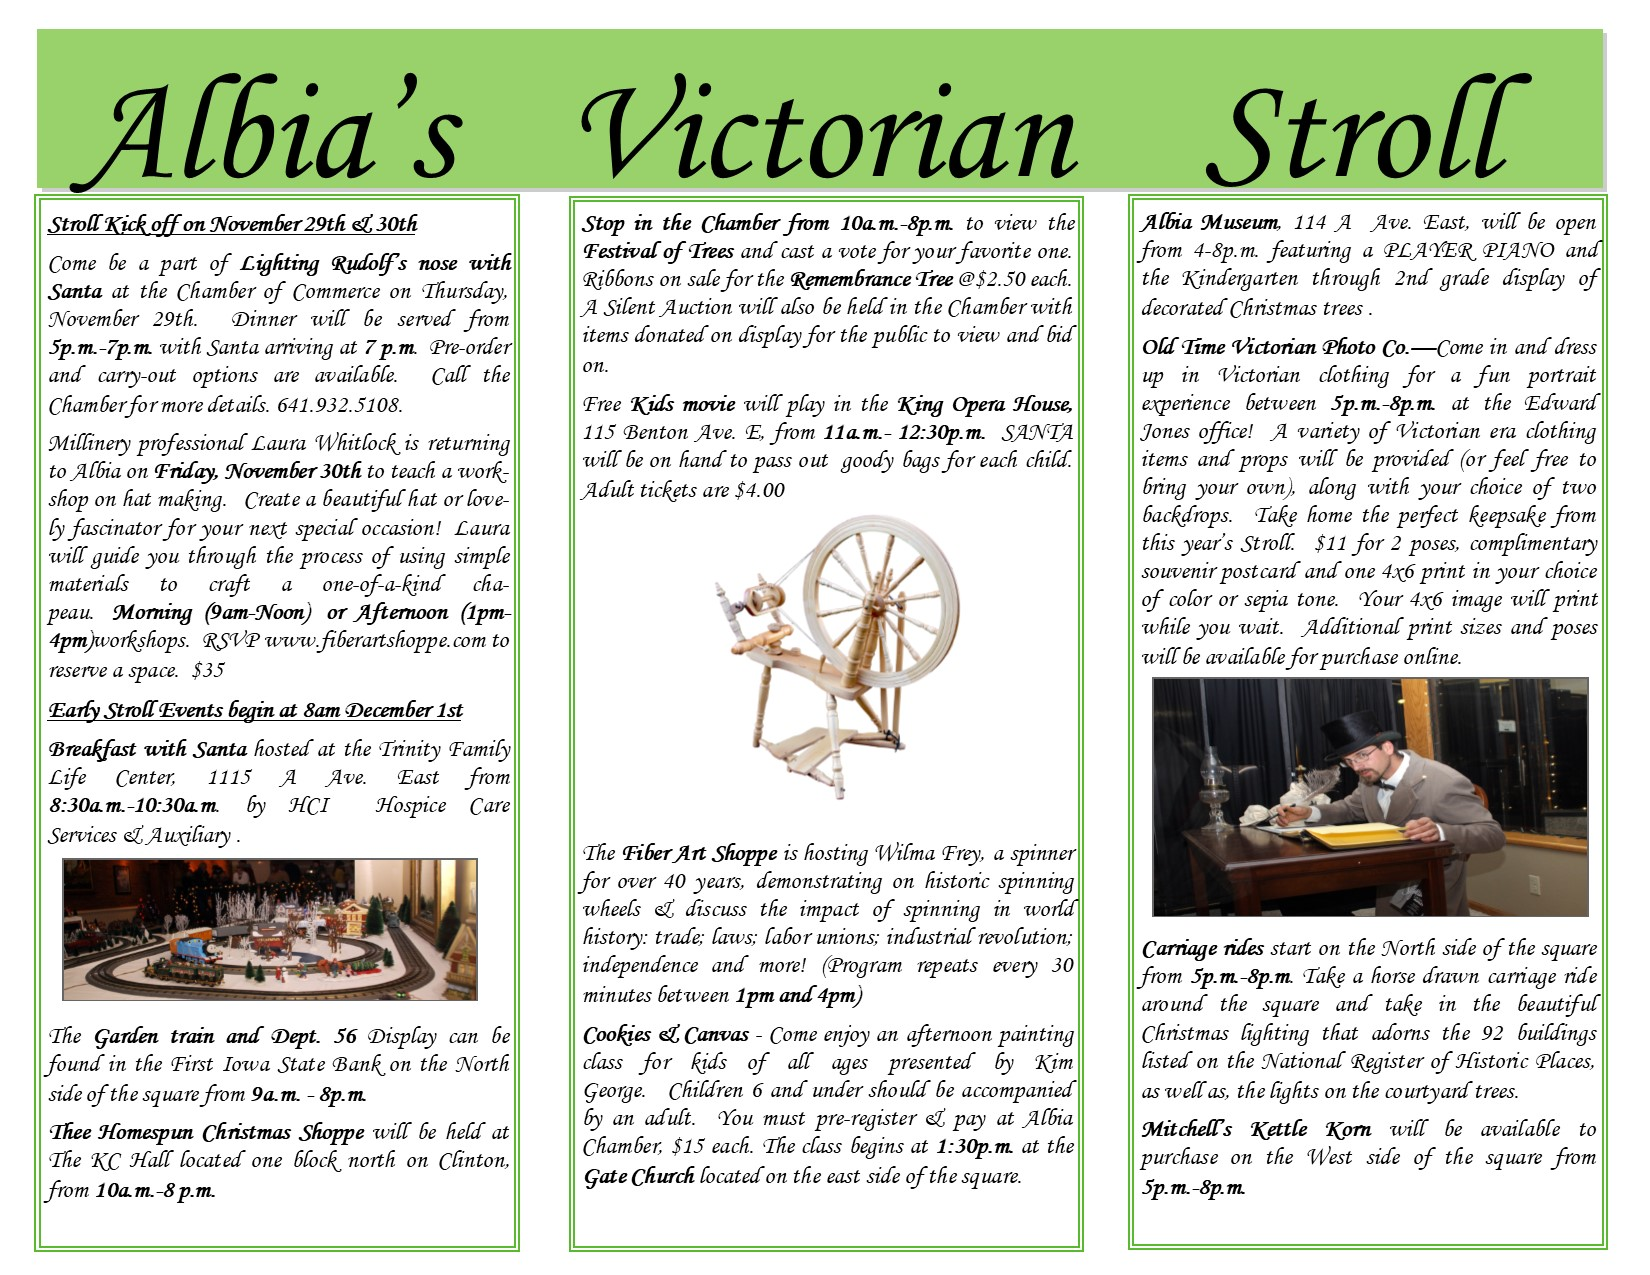 2017-Victorian-Stroll-Brochure.jpg